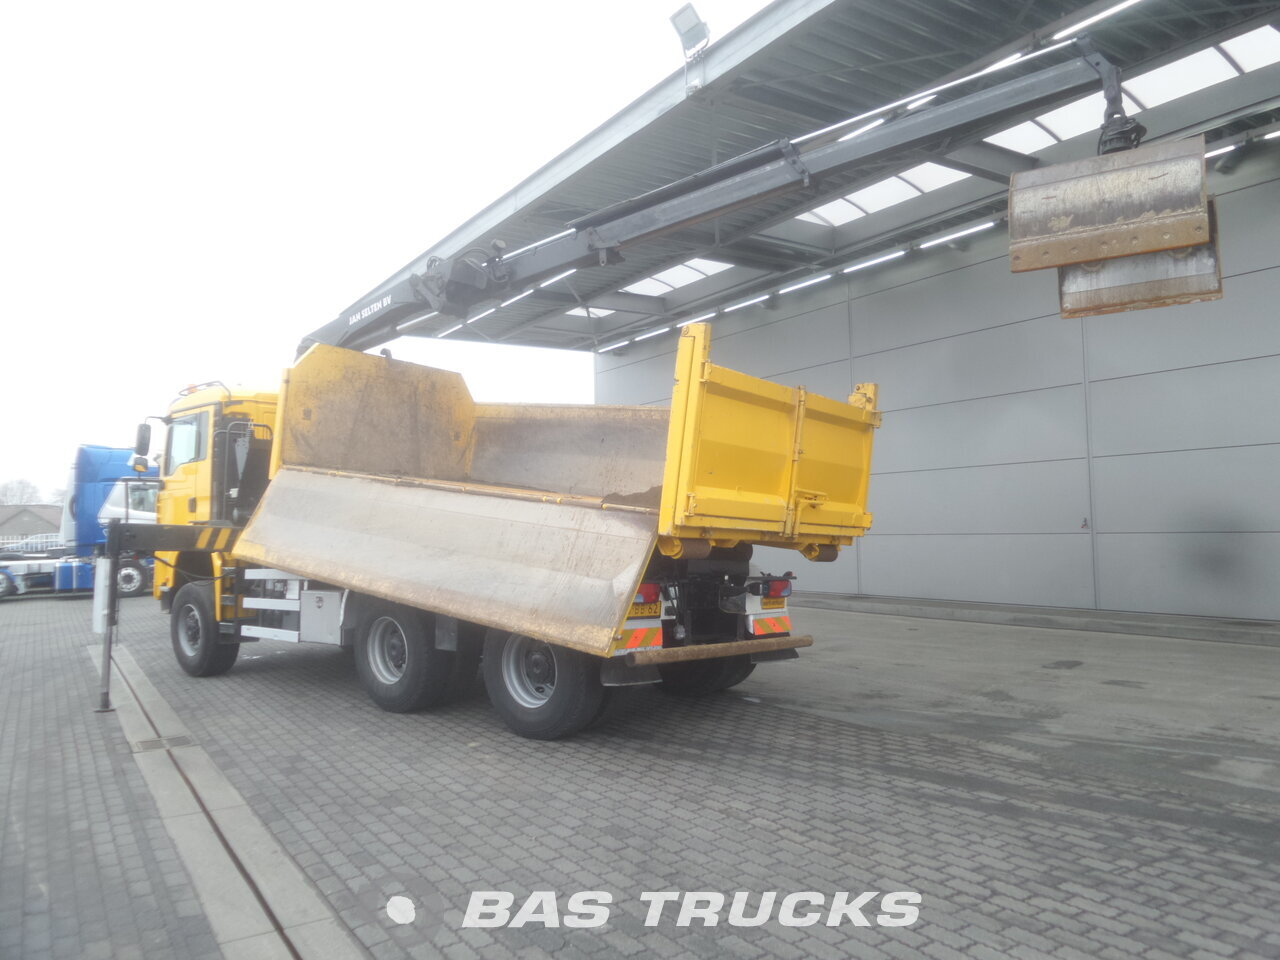 man tga m lkw euro 3 42200 bas trucks. Black Bedroom Furniture Sets. Home Design Ideas